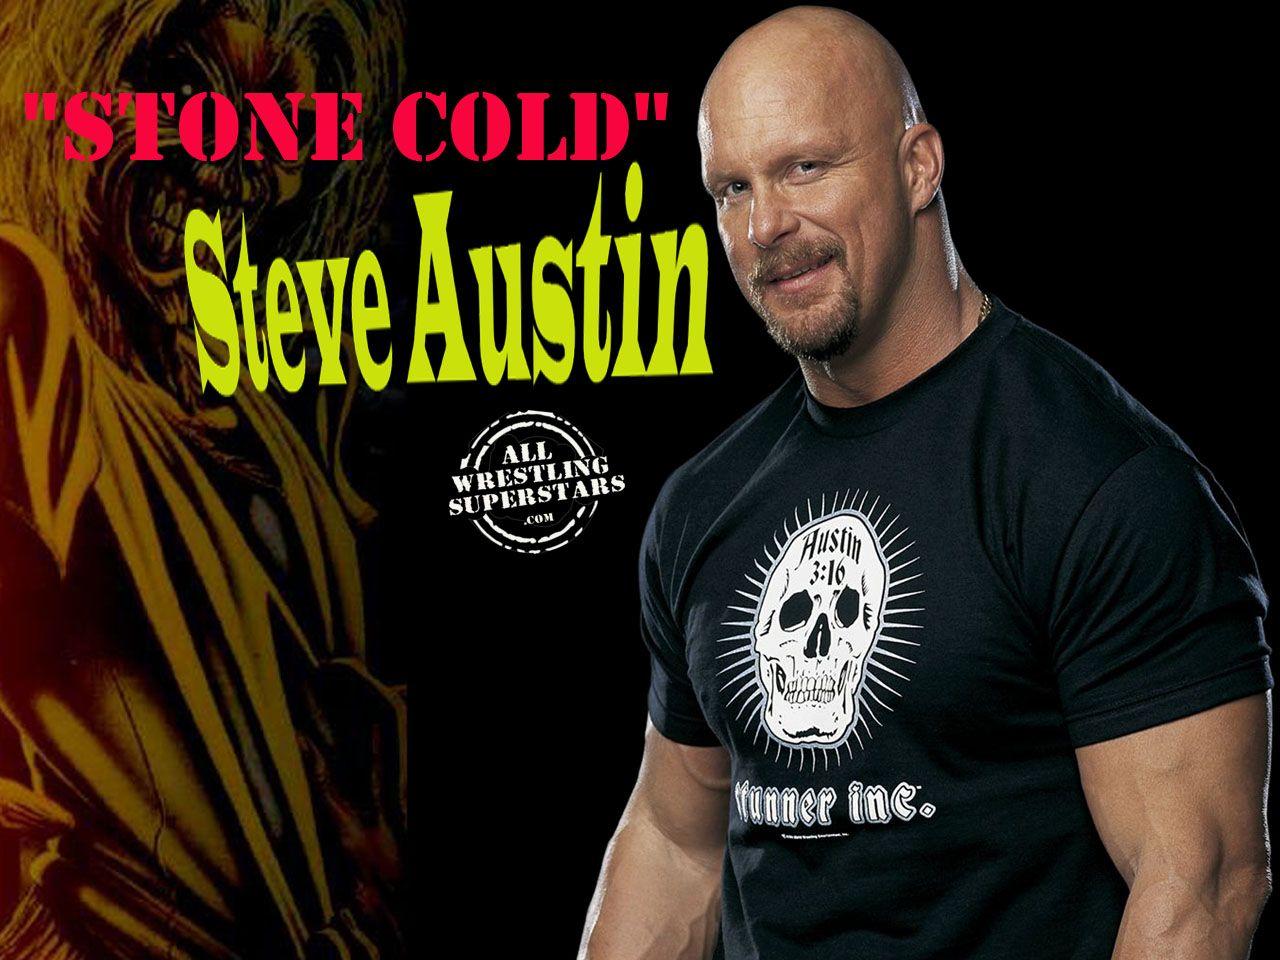 Wwe Stone Cold Steve Austin Austin Wallpaper Wwe Stone Cold Wwe